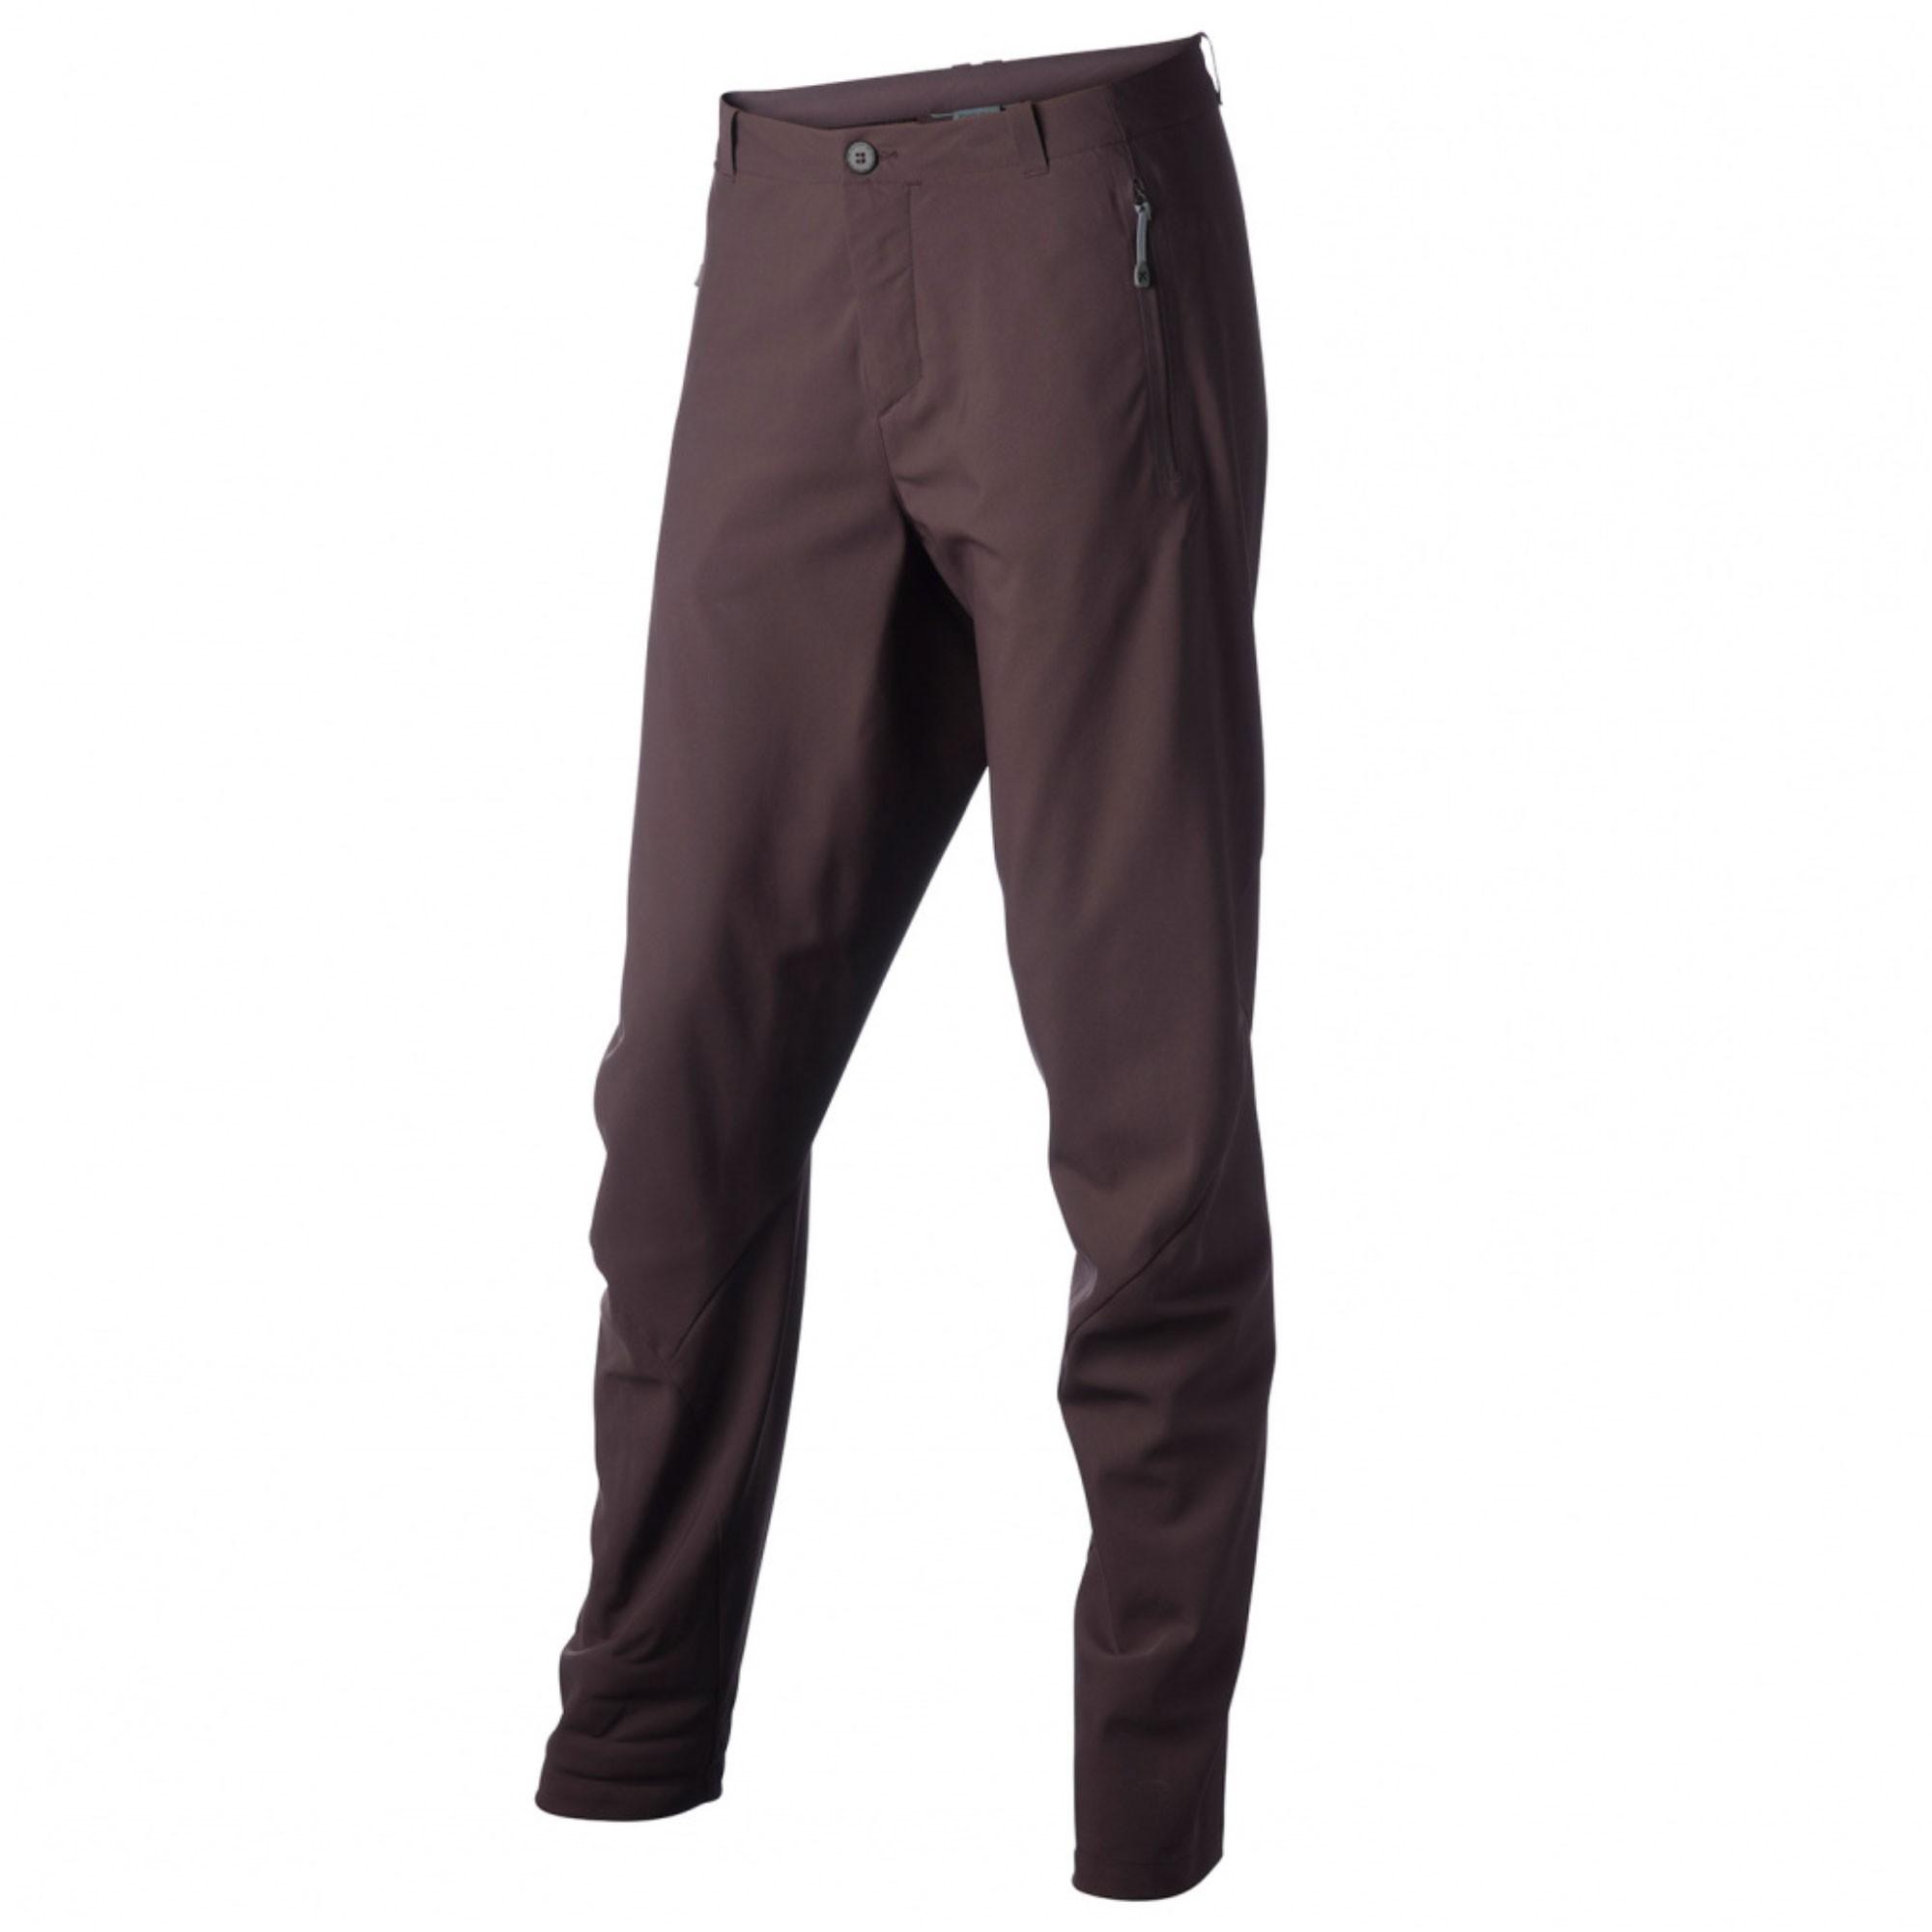 HOUDINI - Women's Motion Light MTM Softshell Pants